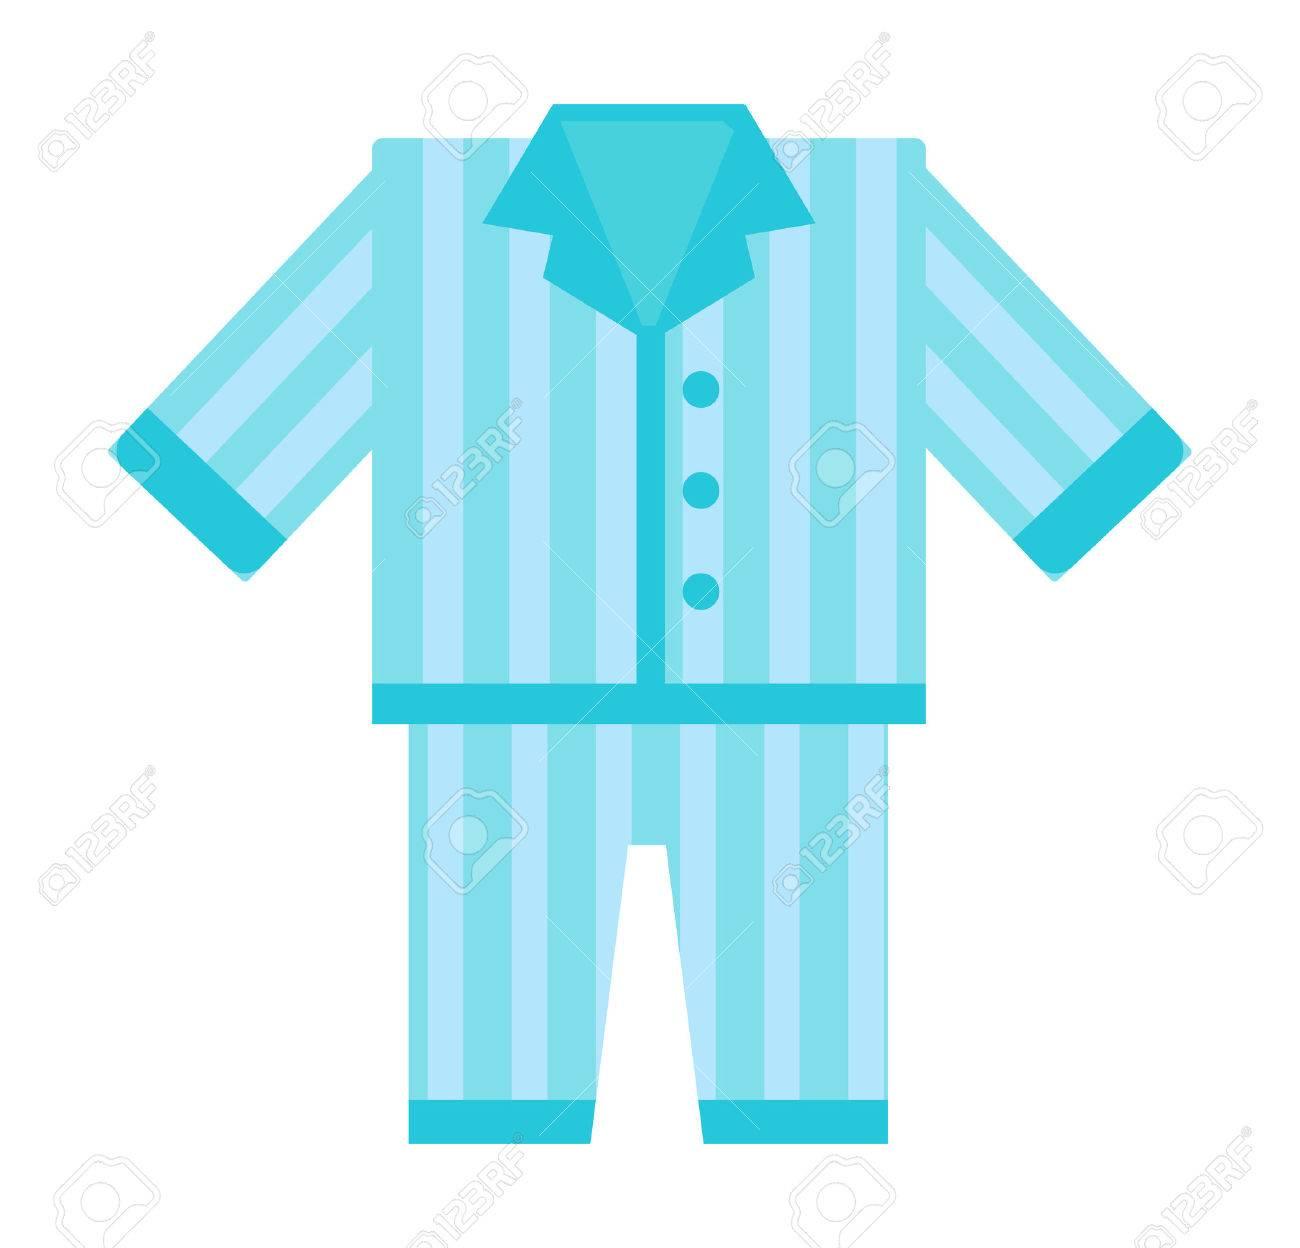 Fashion kid art comfort blue pajamas doodle vector. Sleep morning pajamas clothes cute bed female lifestyle illustration. Casual nightwear teenage pajamas cartoon clothing design. - 63722852